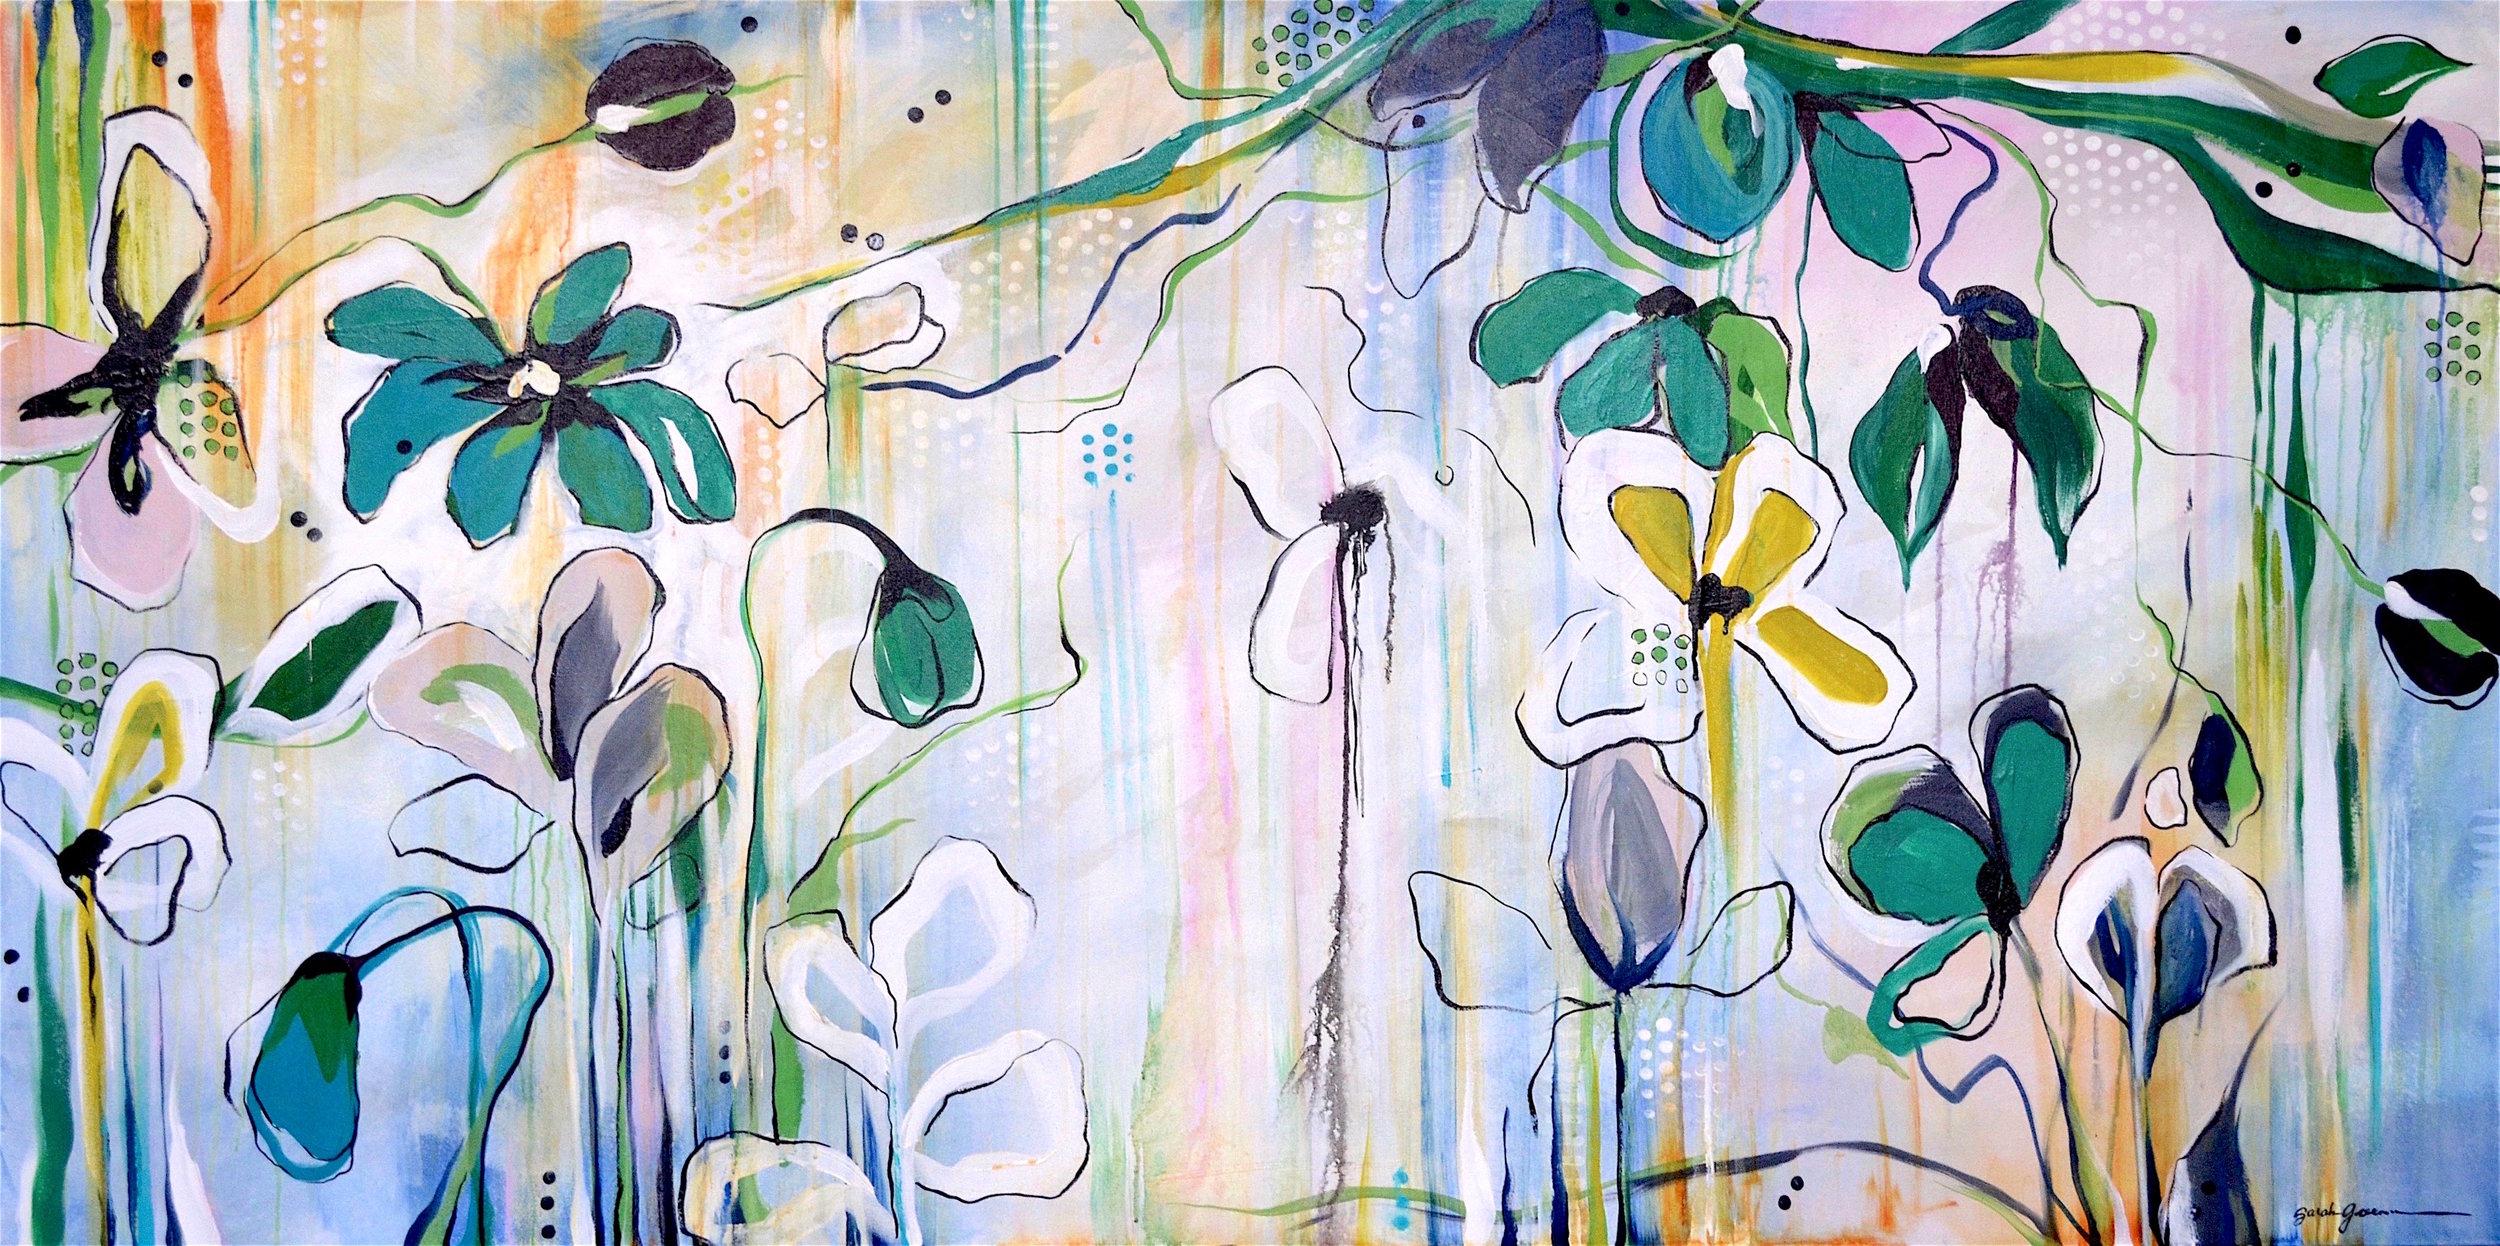 Efflorescence  | 36 x 72 inch acrylic on canvas